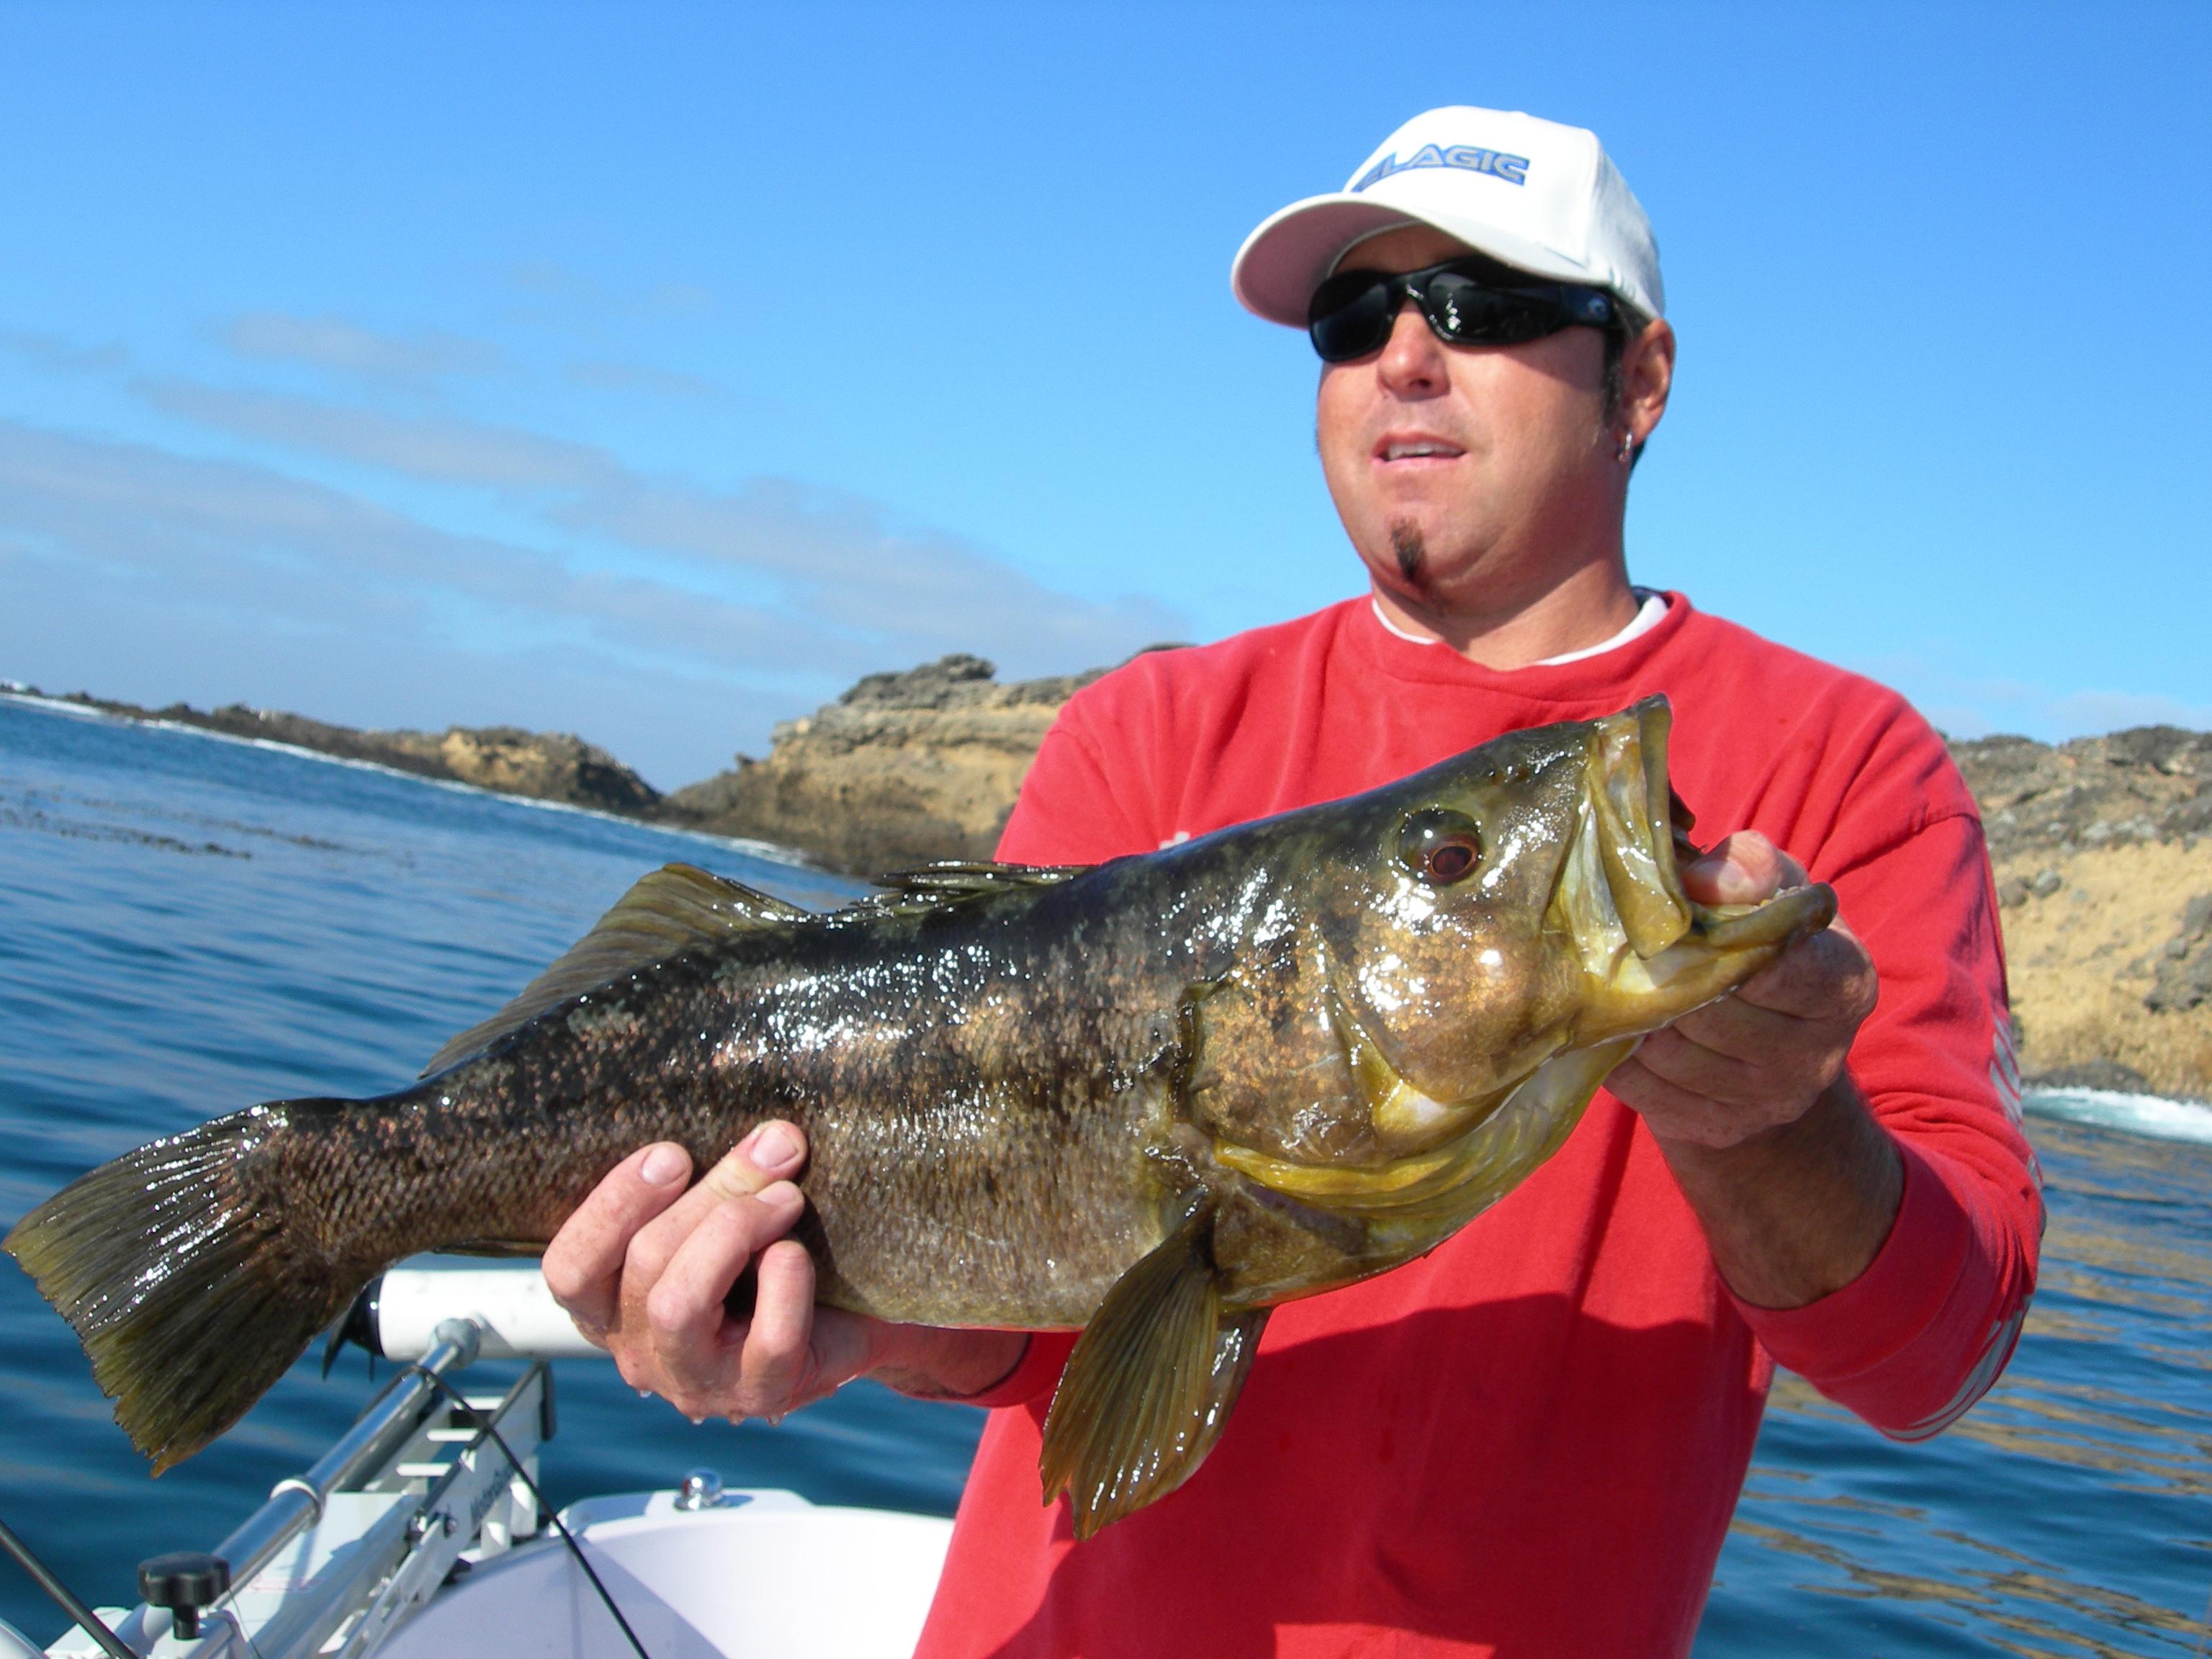 Fishing big baits will produce saltwater bass anglers swba for Calico bass fishing